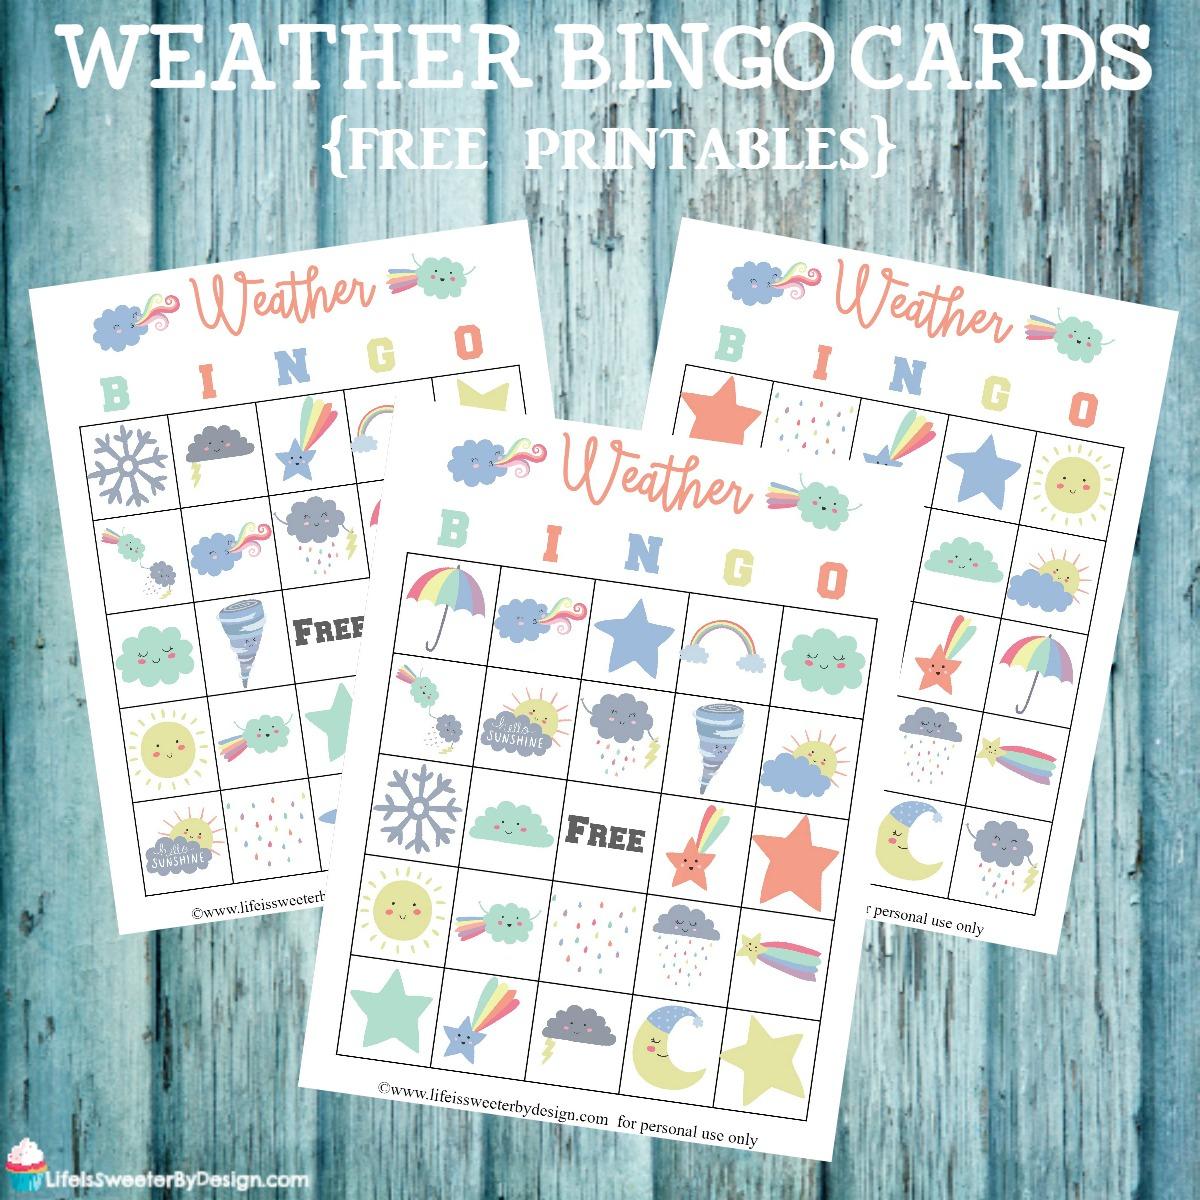 Weather Bingo Free Printable Cards - Life Is Sweeterdesign